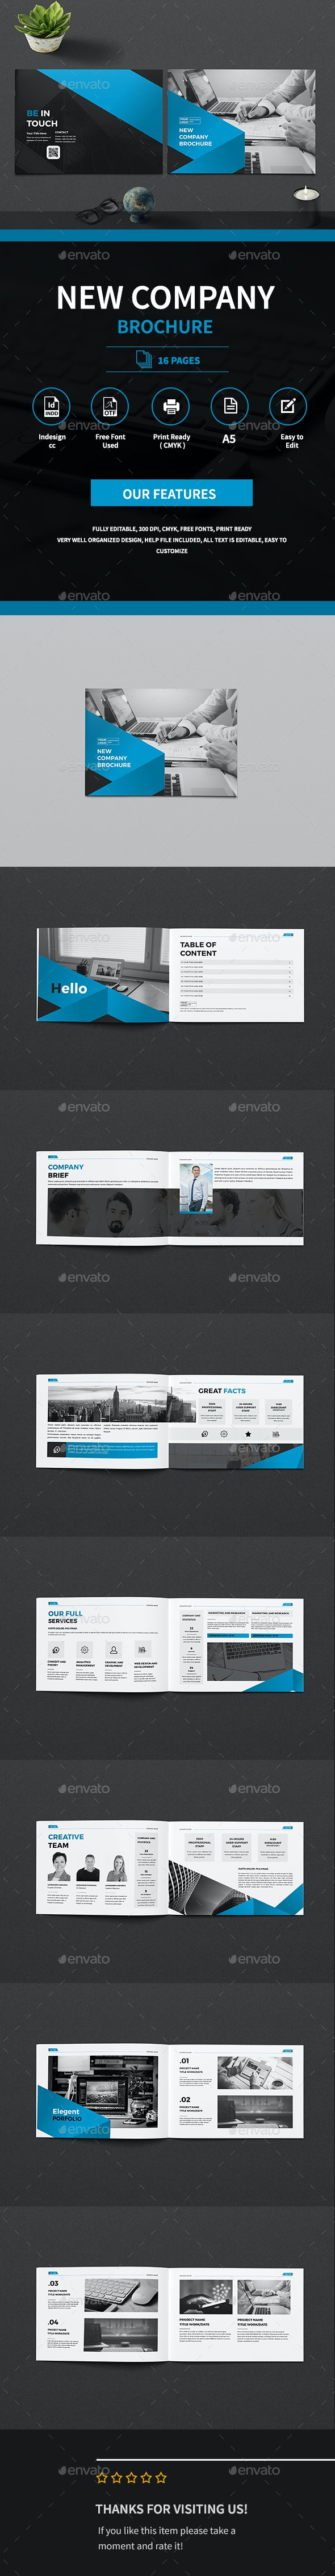 A5 Business Company Brochure - Corporate Brochures